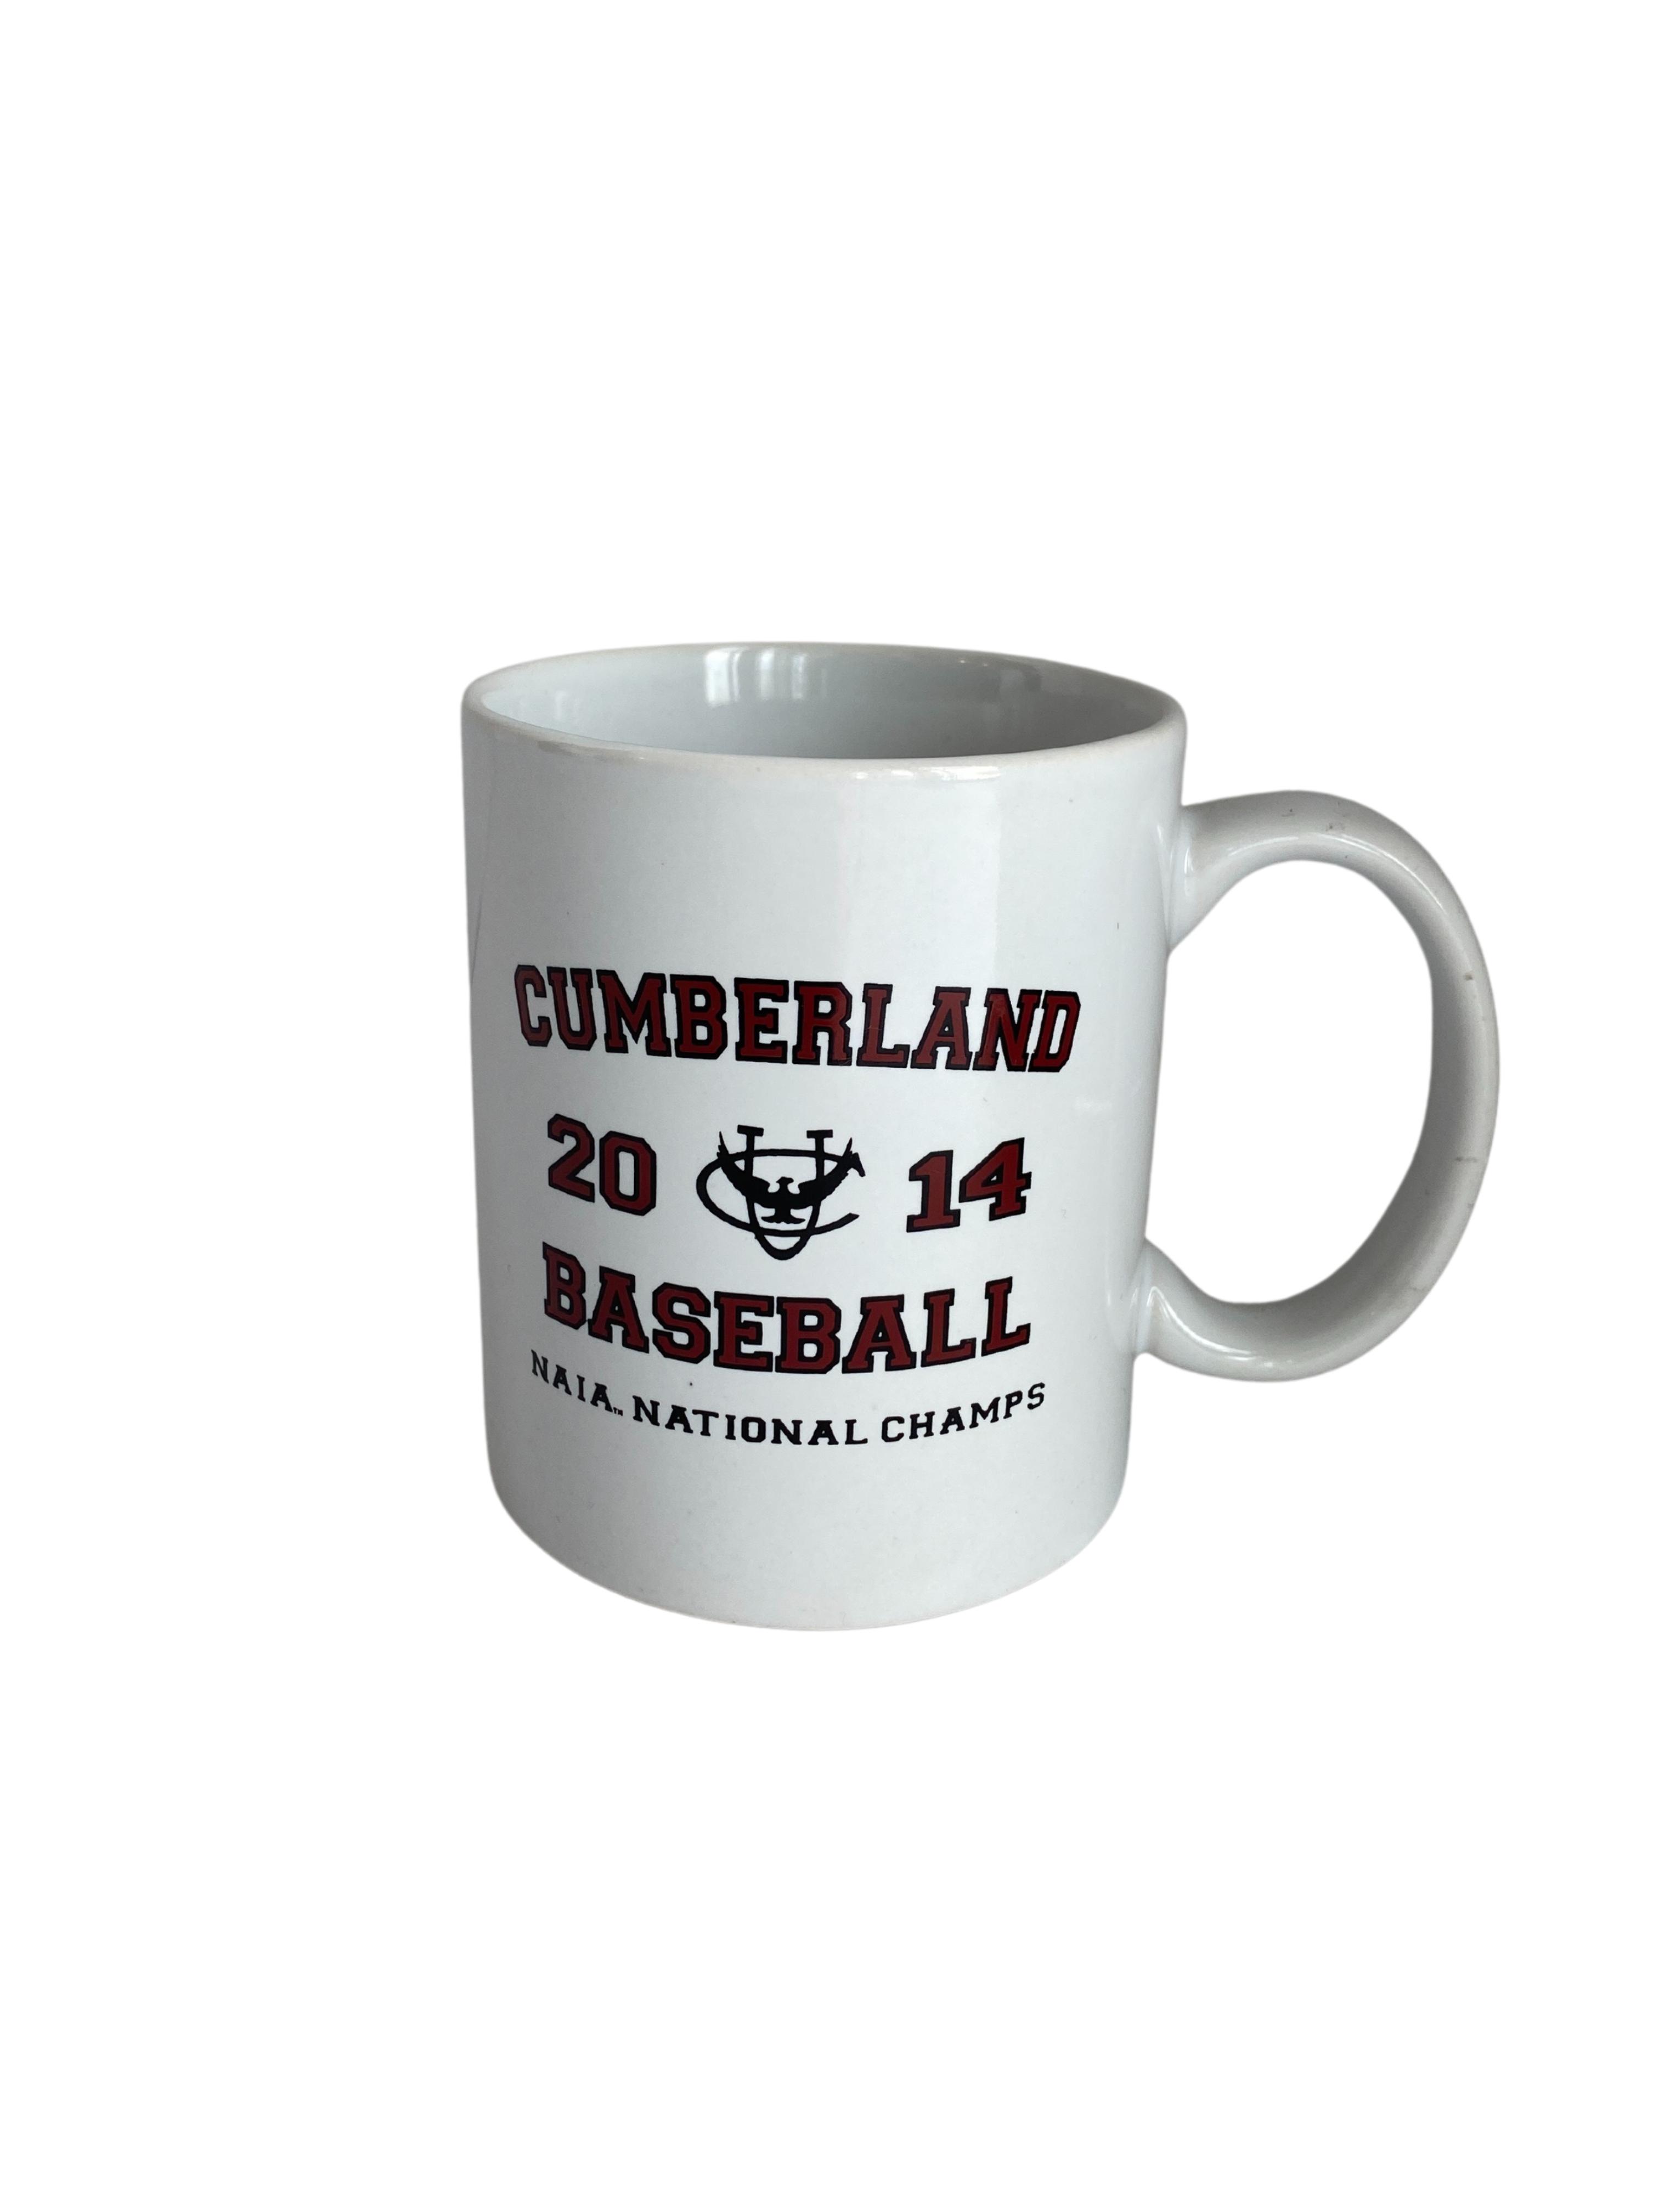 NAIA Champs Baseball Mug - 5232